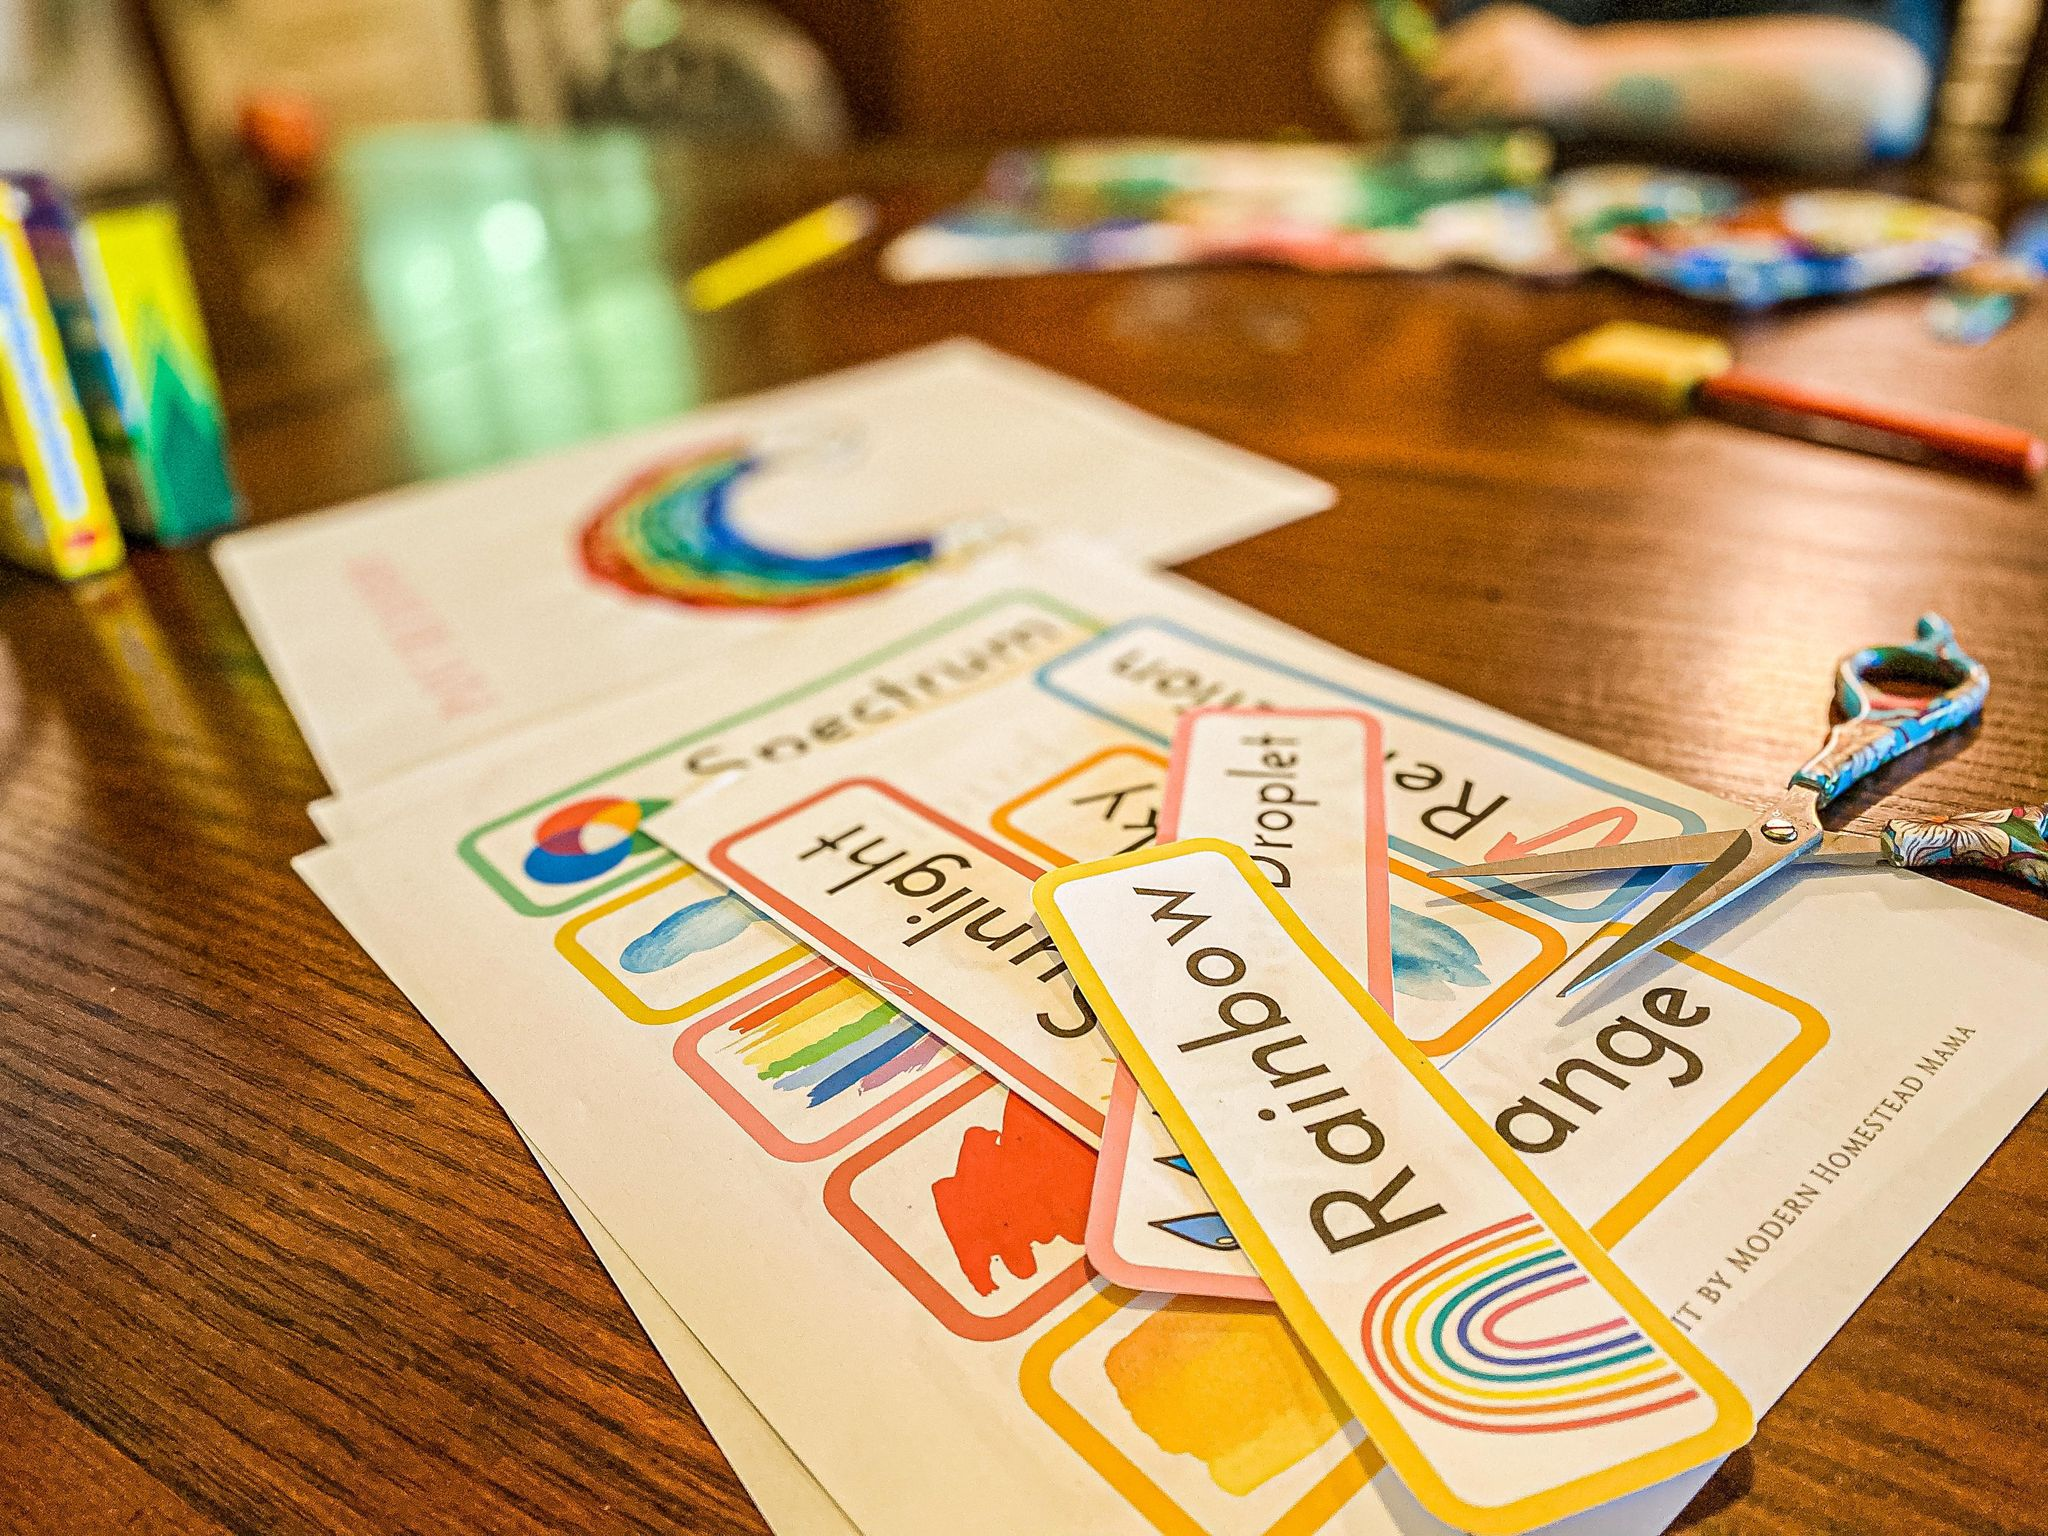 Homeschool Preschool: What You Need to Know | Modern Homestead Mama